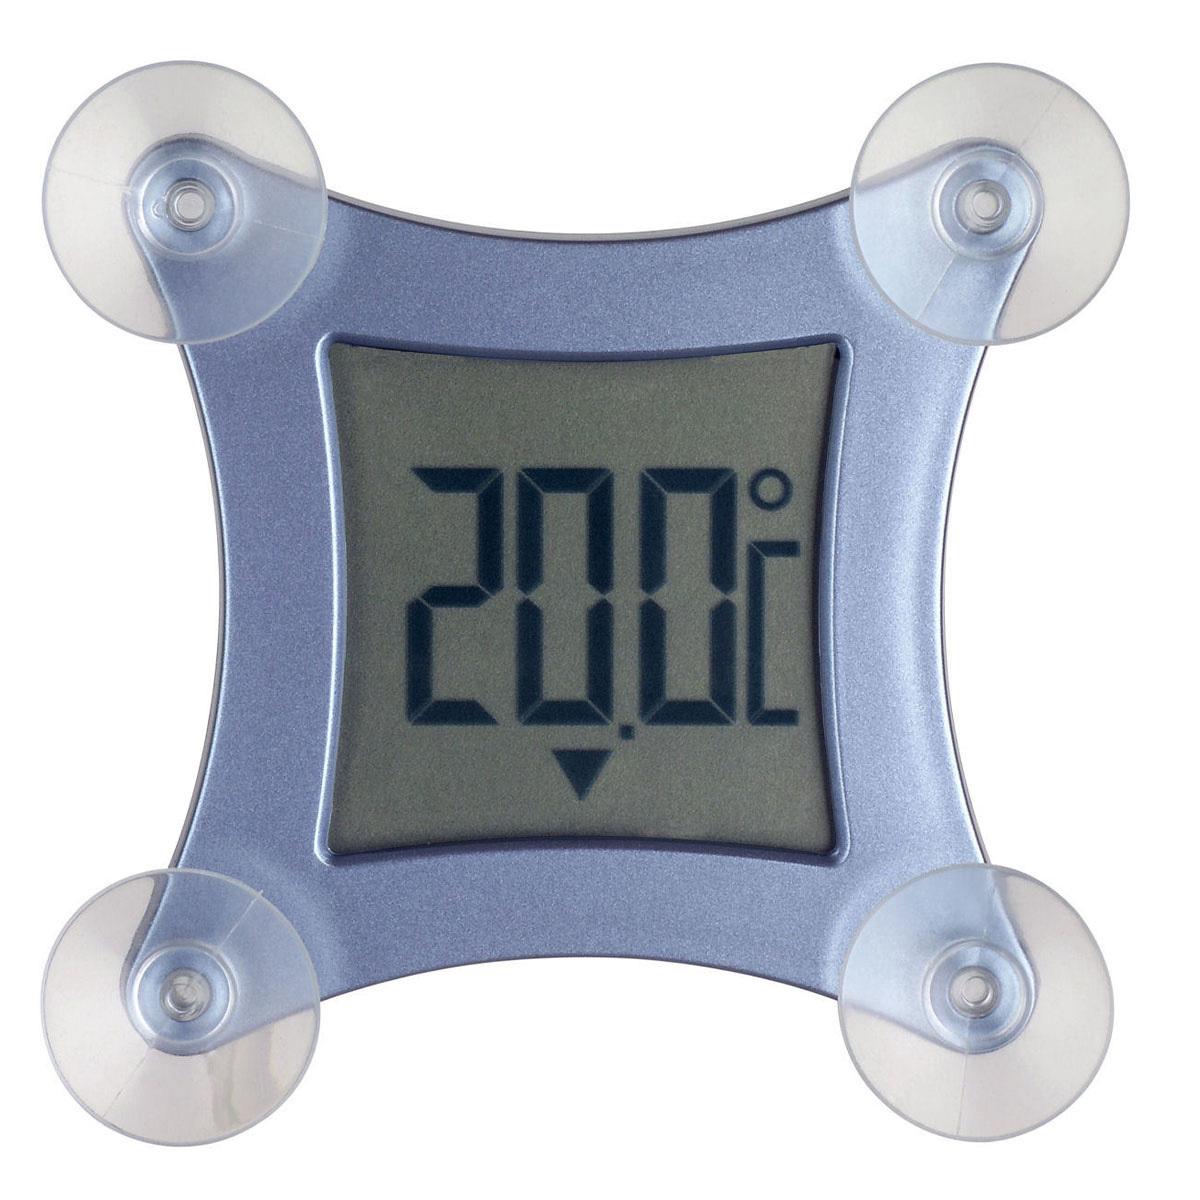 30-1026-digitales-fensterthermometer-pocco-1200x1200px.jpg